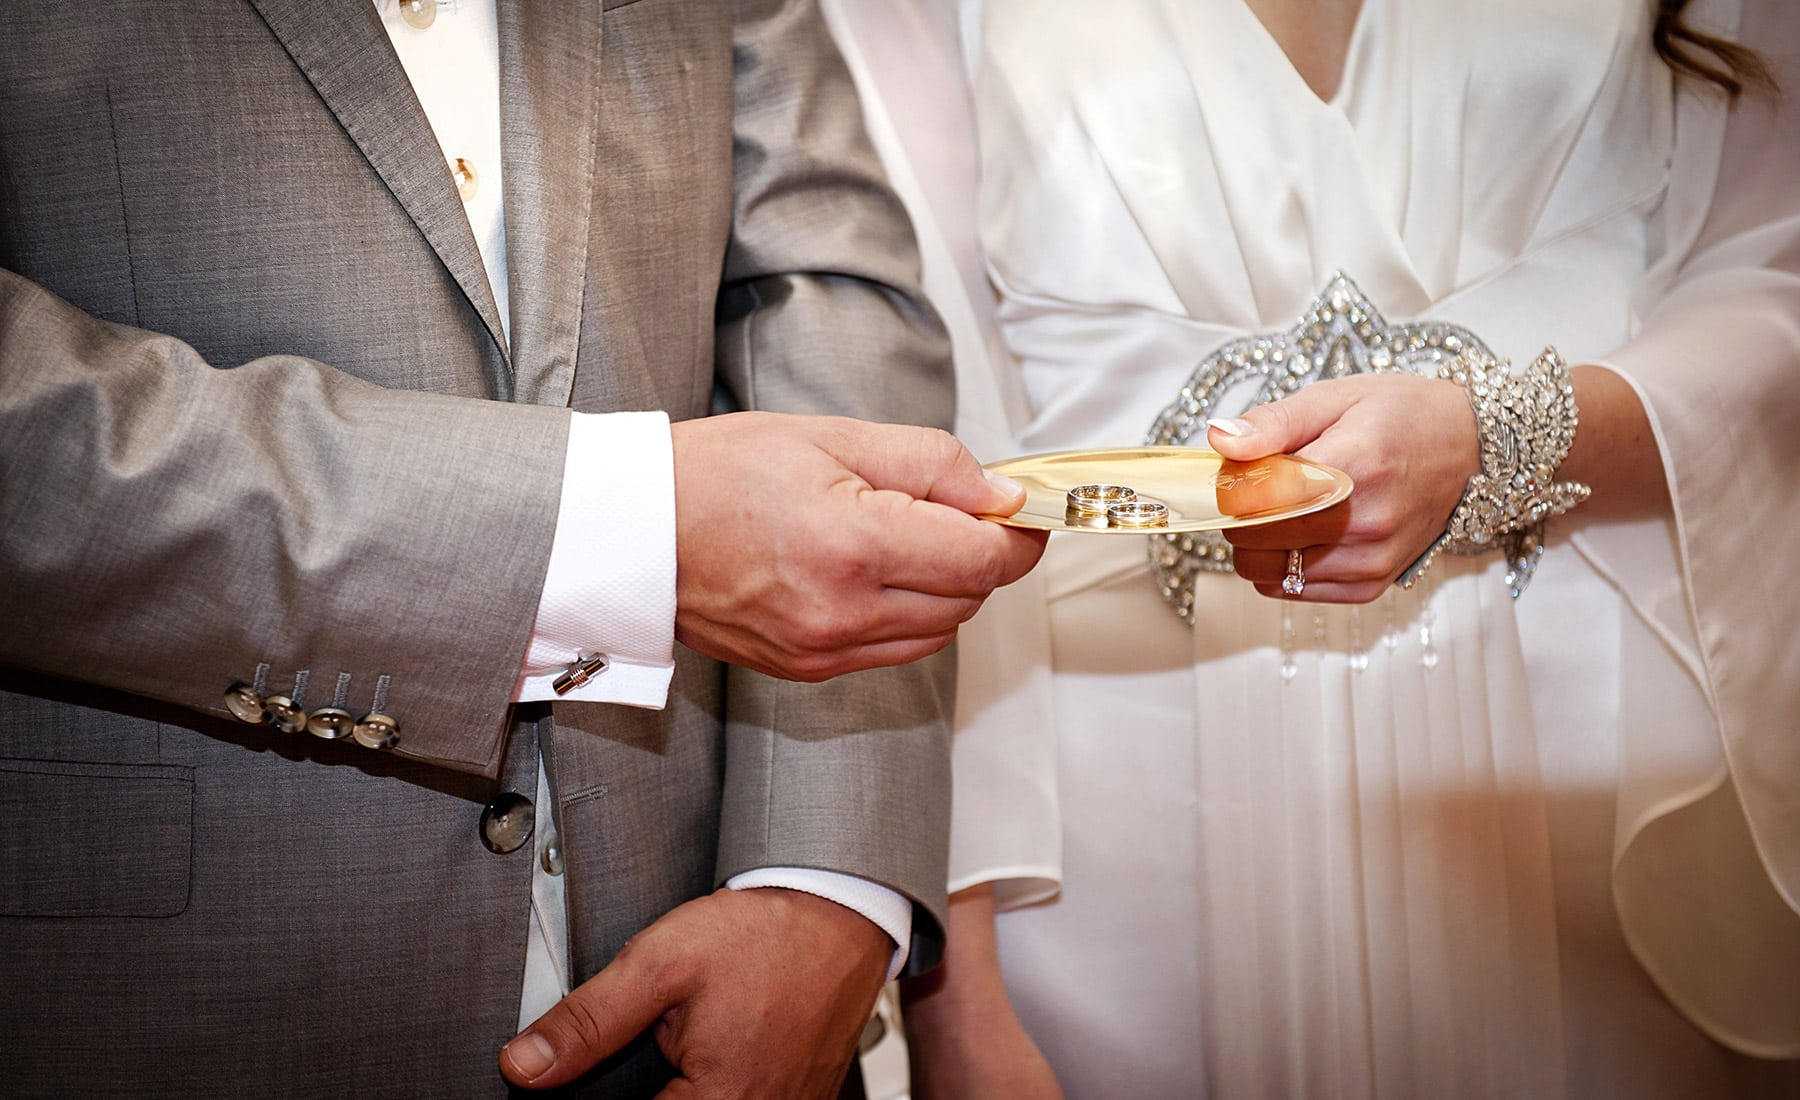 Pablo Matrimonio Biblia : Espiritualidad del matrimonio por tu matrimonio